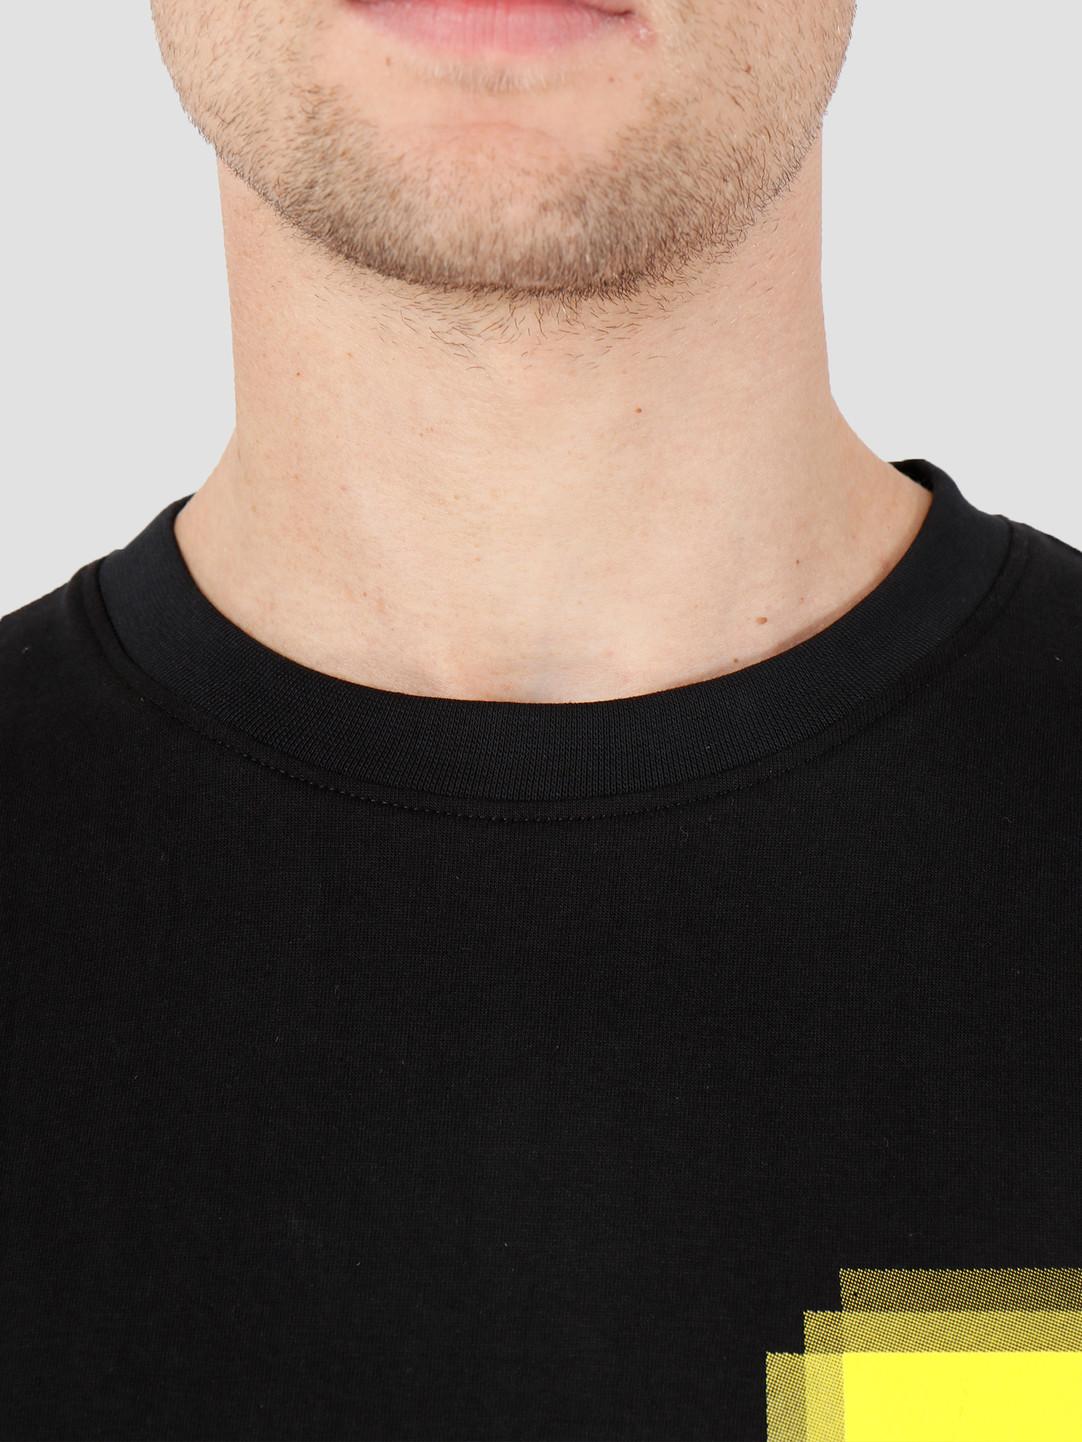 FRESHCOTTON x ADE FRESHCOTTON x ADE Faded Print T-shirt Black